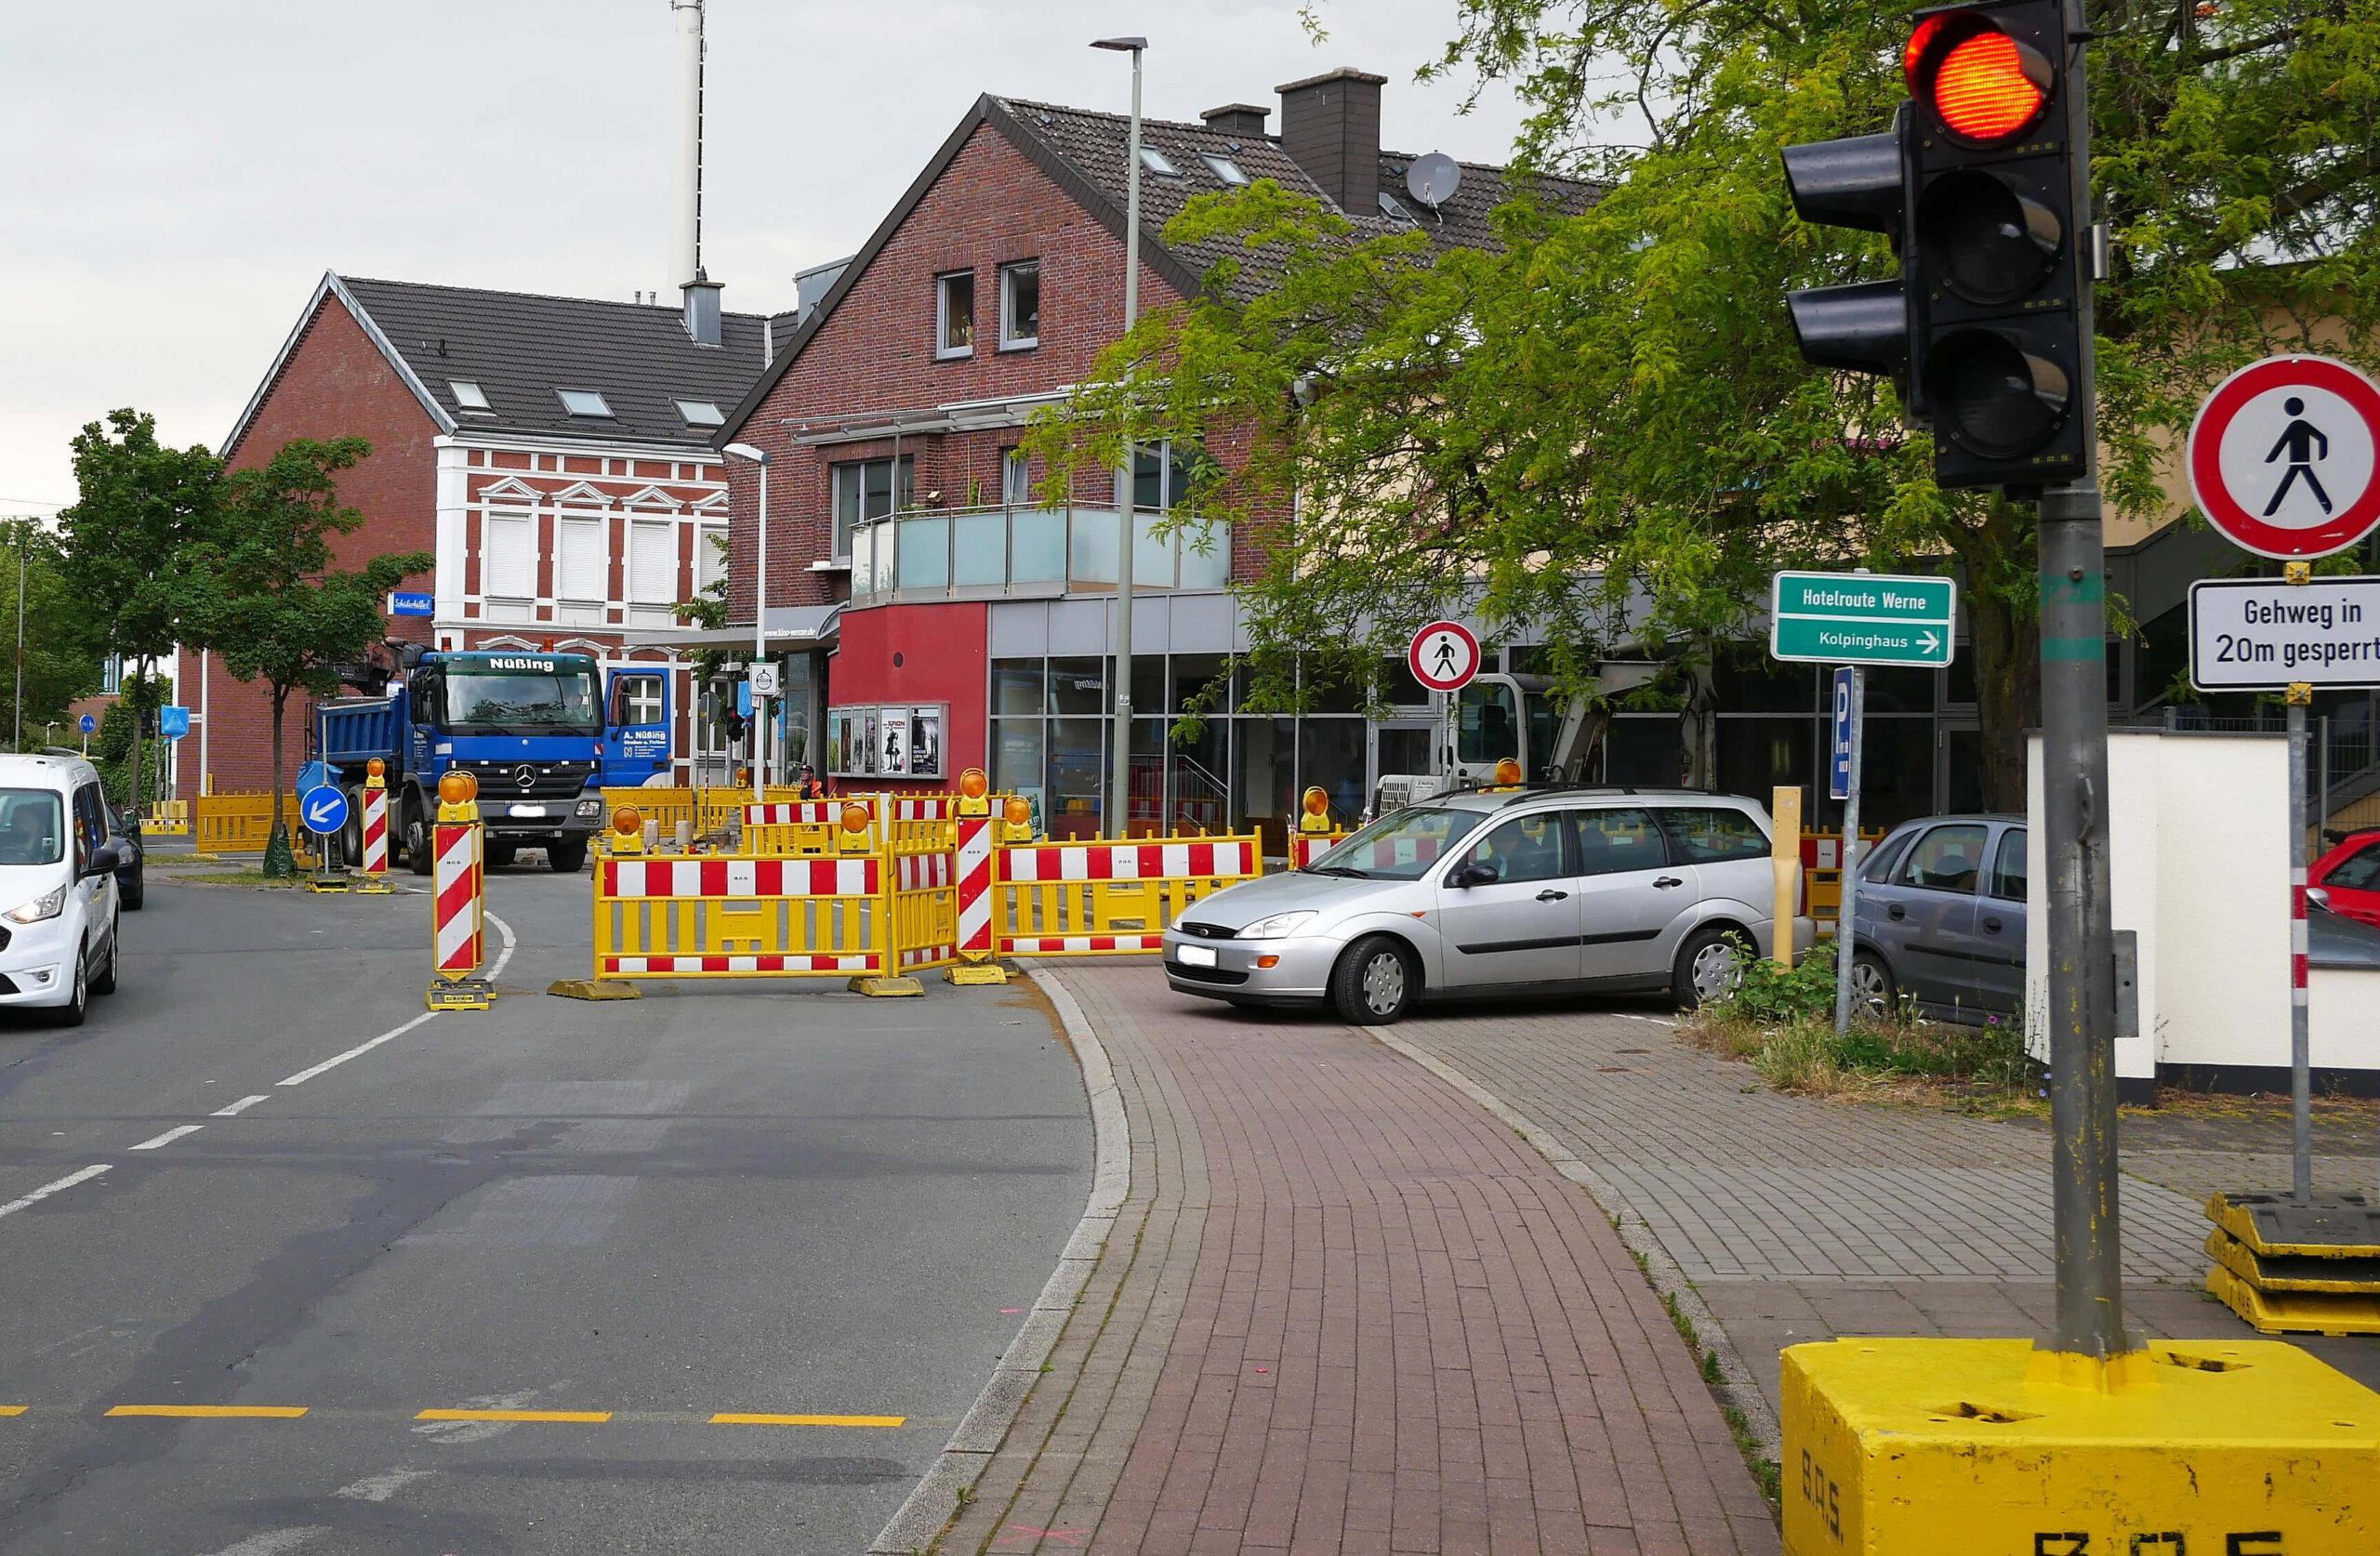 Die Baustelle am Kino soll heute abgeschlossen werden. Foto: Gaby Brüggemann